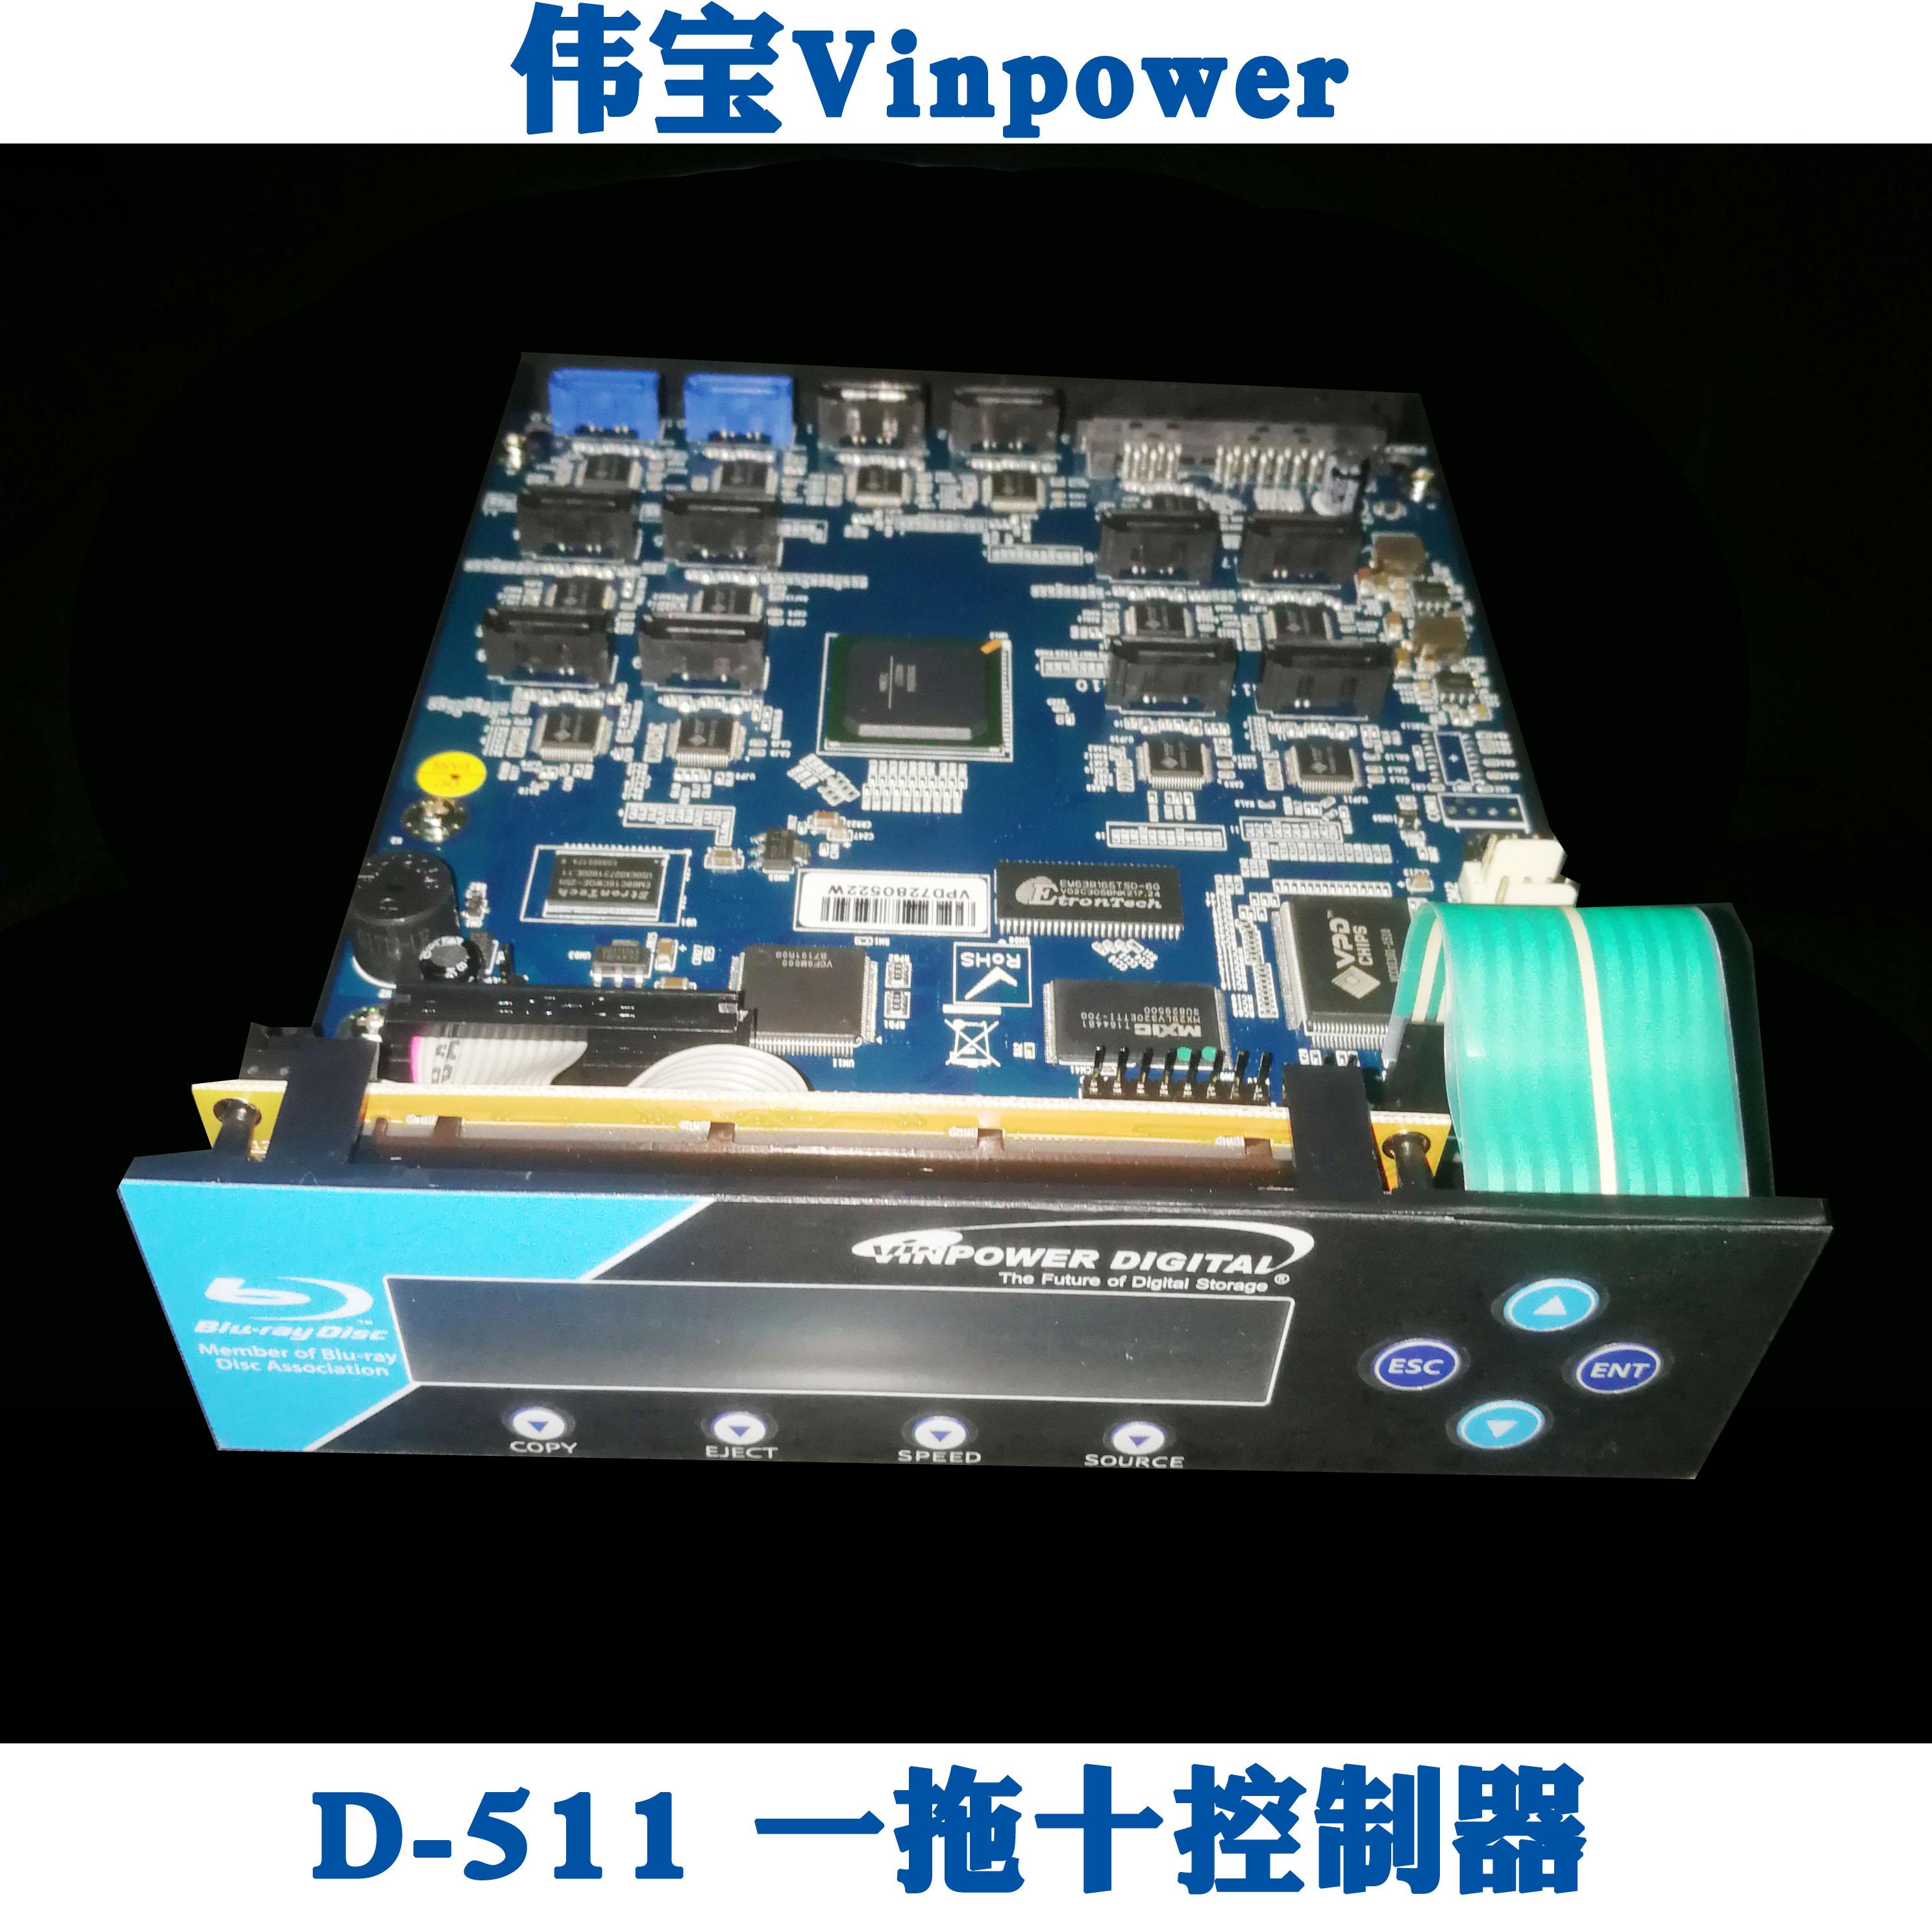 Vinpower伟宝D-511控制器1拖11蓝光盘拷贝机刻录塔拖头128M缓存